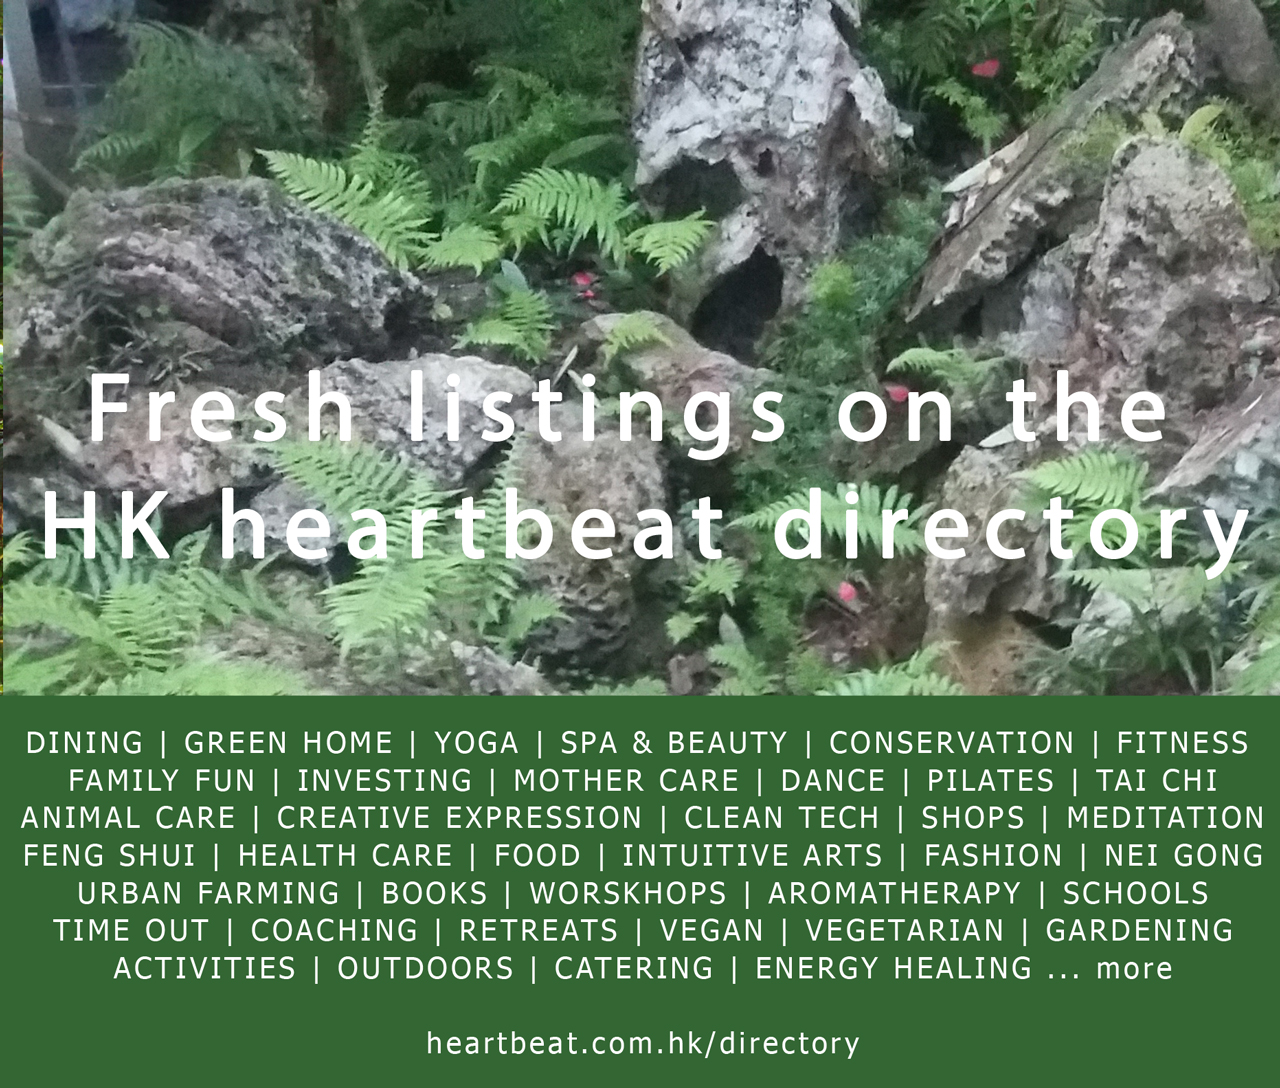 Fresh directory listings